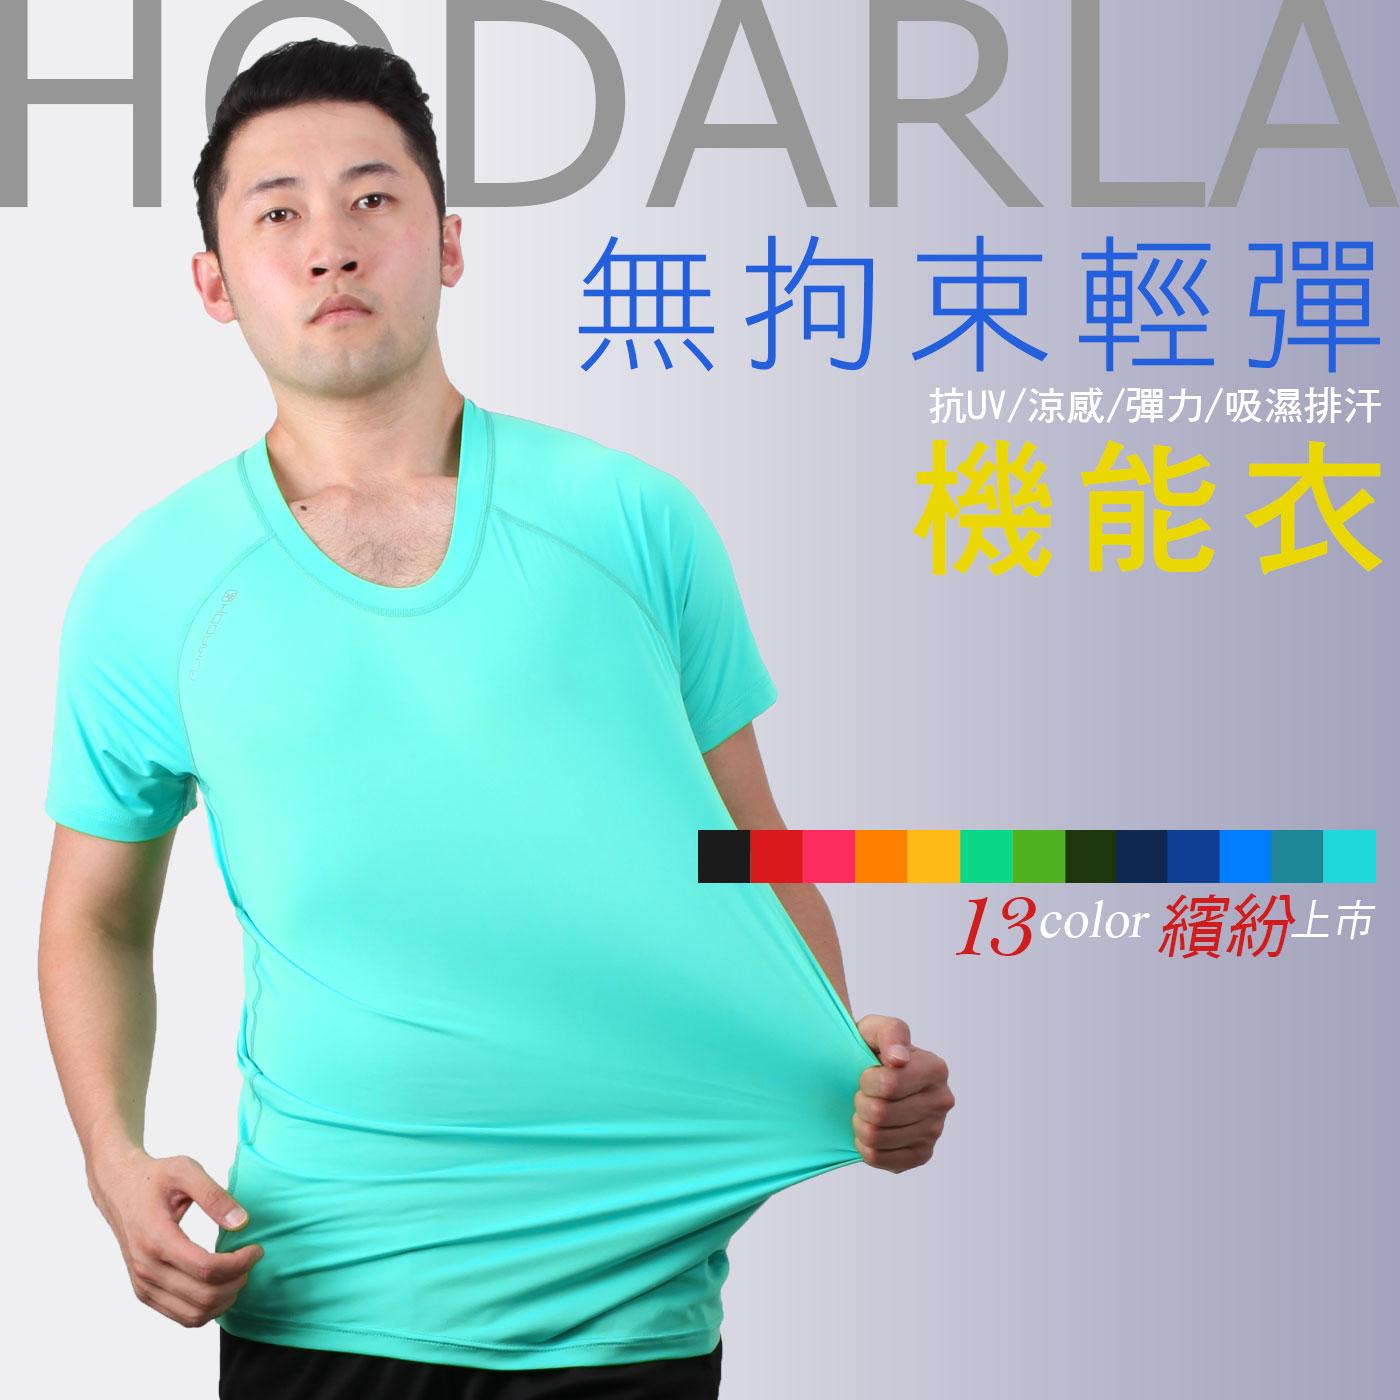 HODARLA 男女無拘束短袖T恤 輕彈 抗UV 圓領 製 涼感 路跑~03312086~